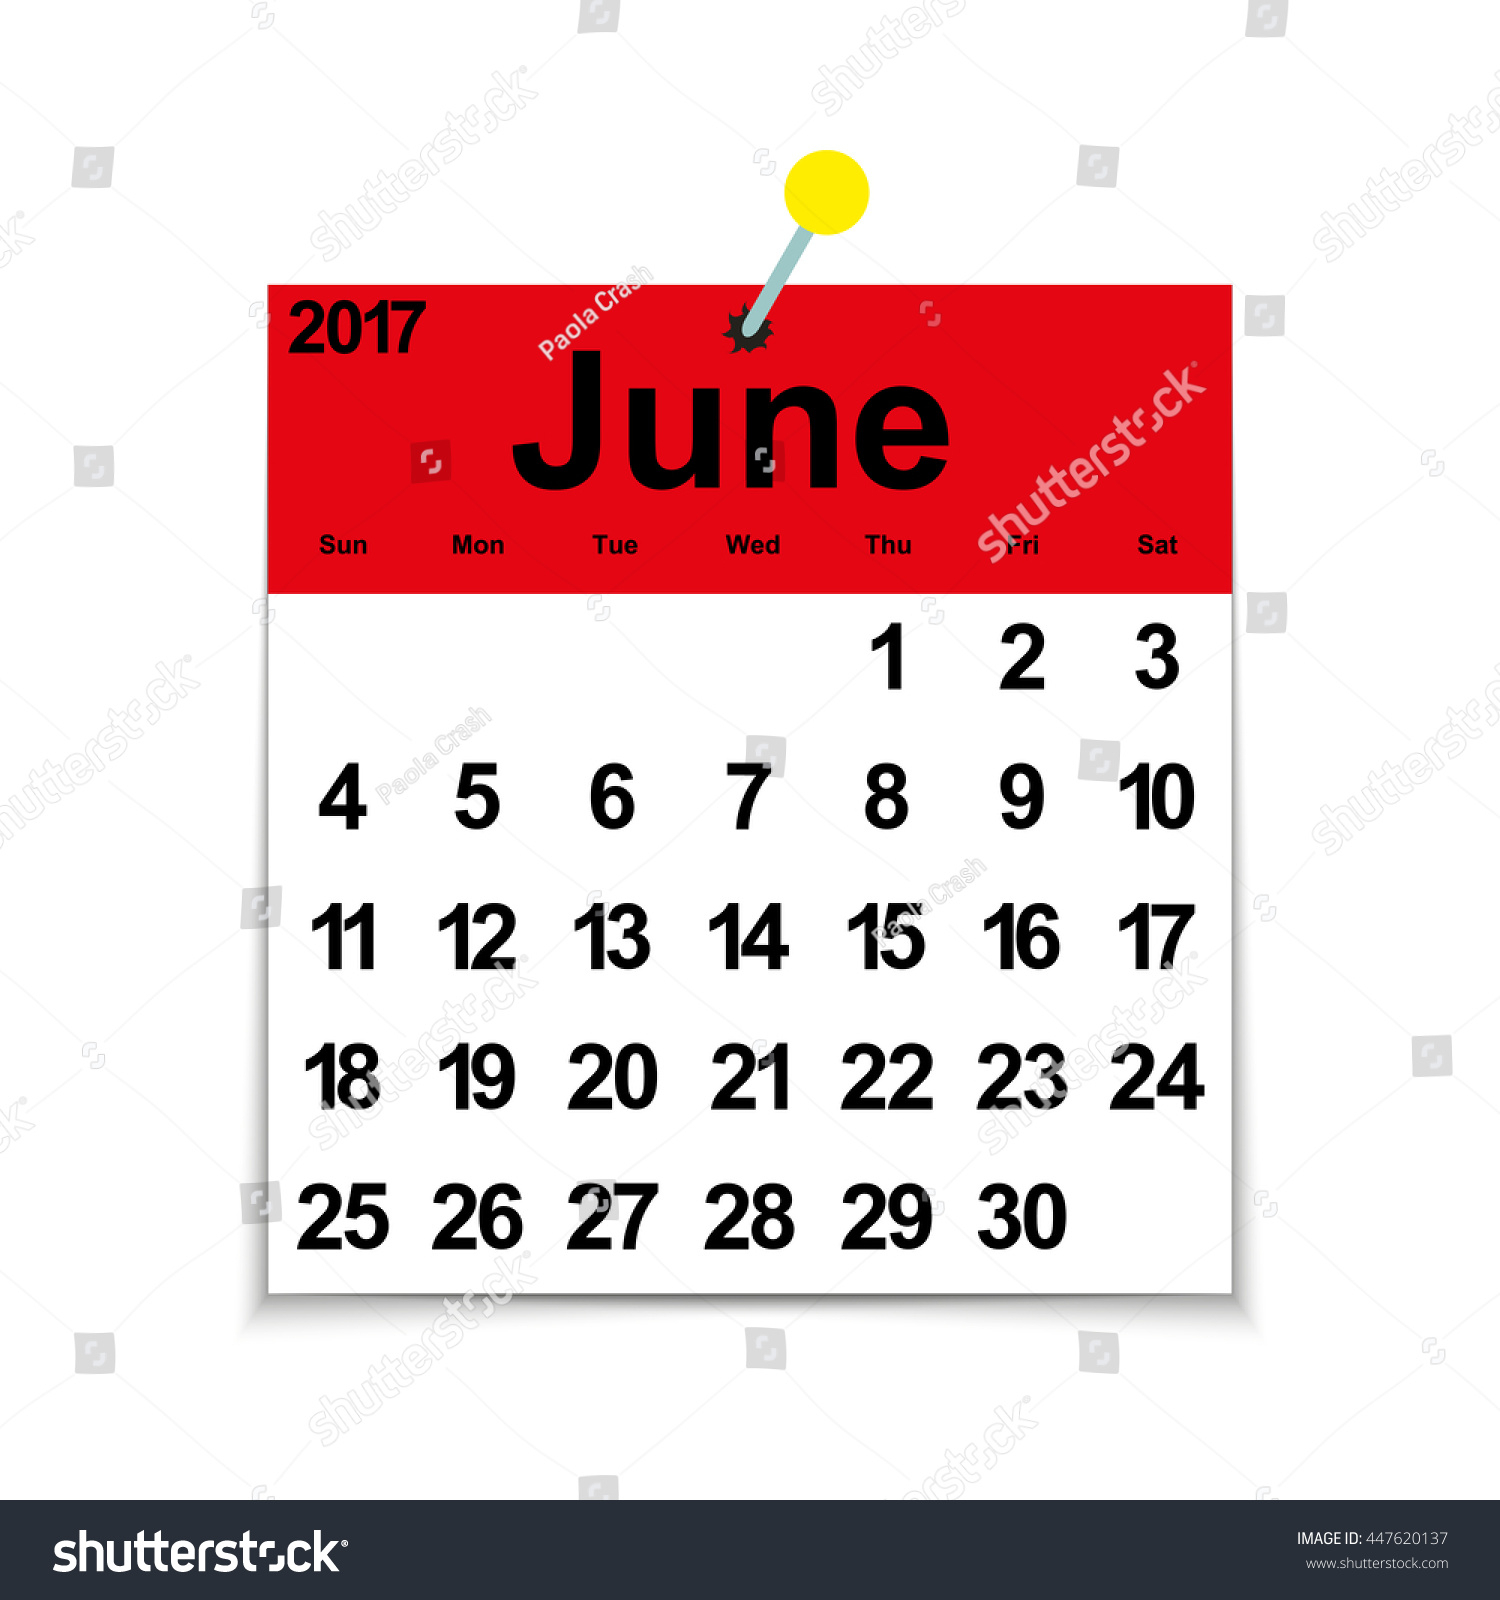 Leaf Calendar 2017 Month June Days Stock Vector (Royalty